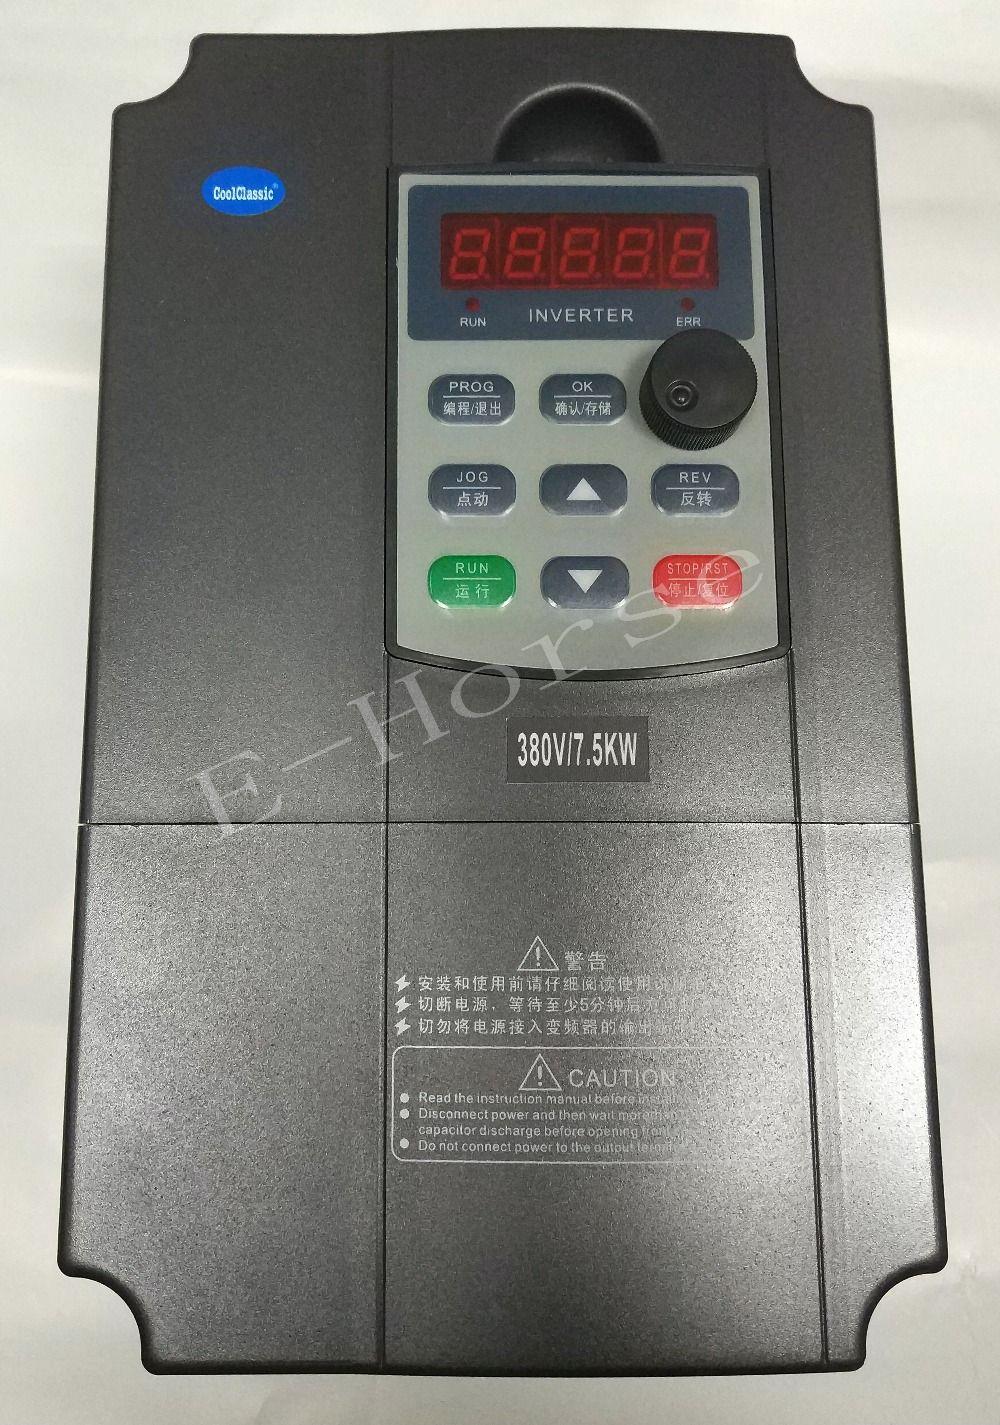 VFD CoolClassic Inverter Converter 380v 7.5KW inverter three phase power warranty 18 month